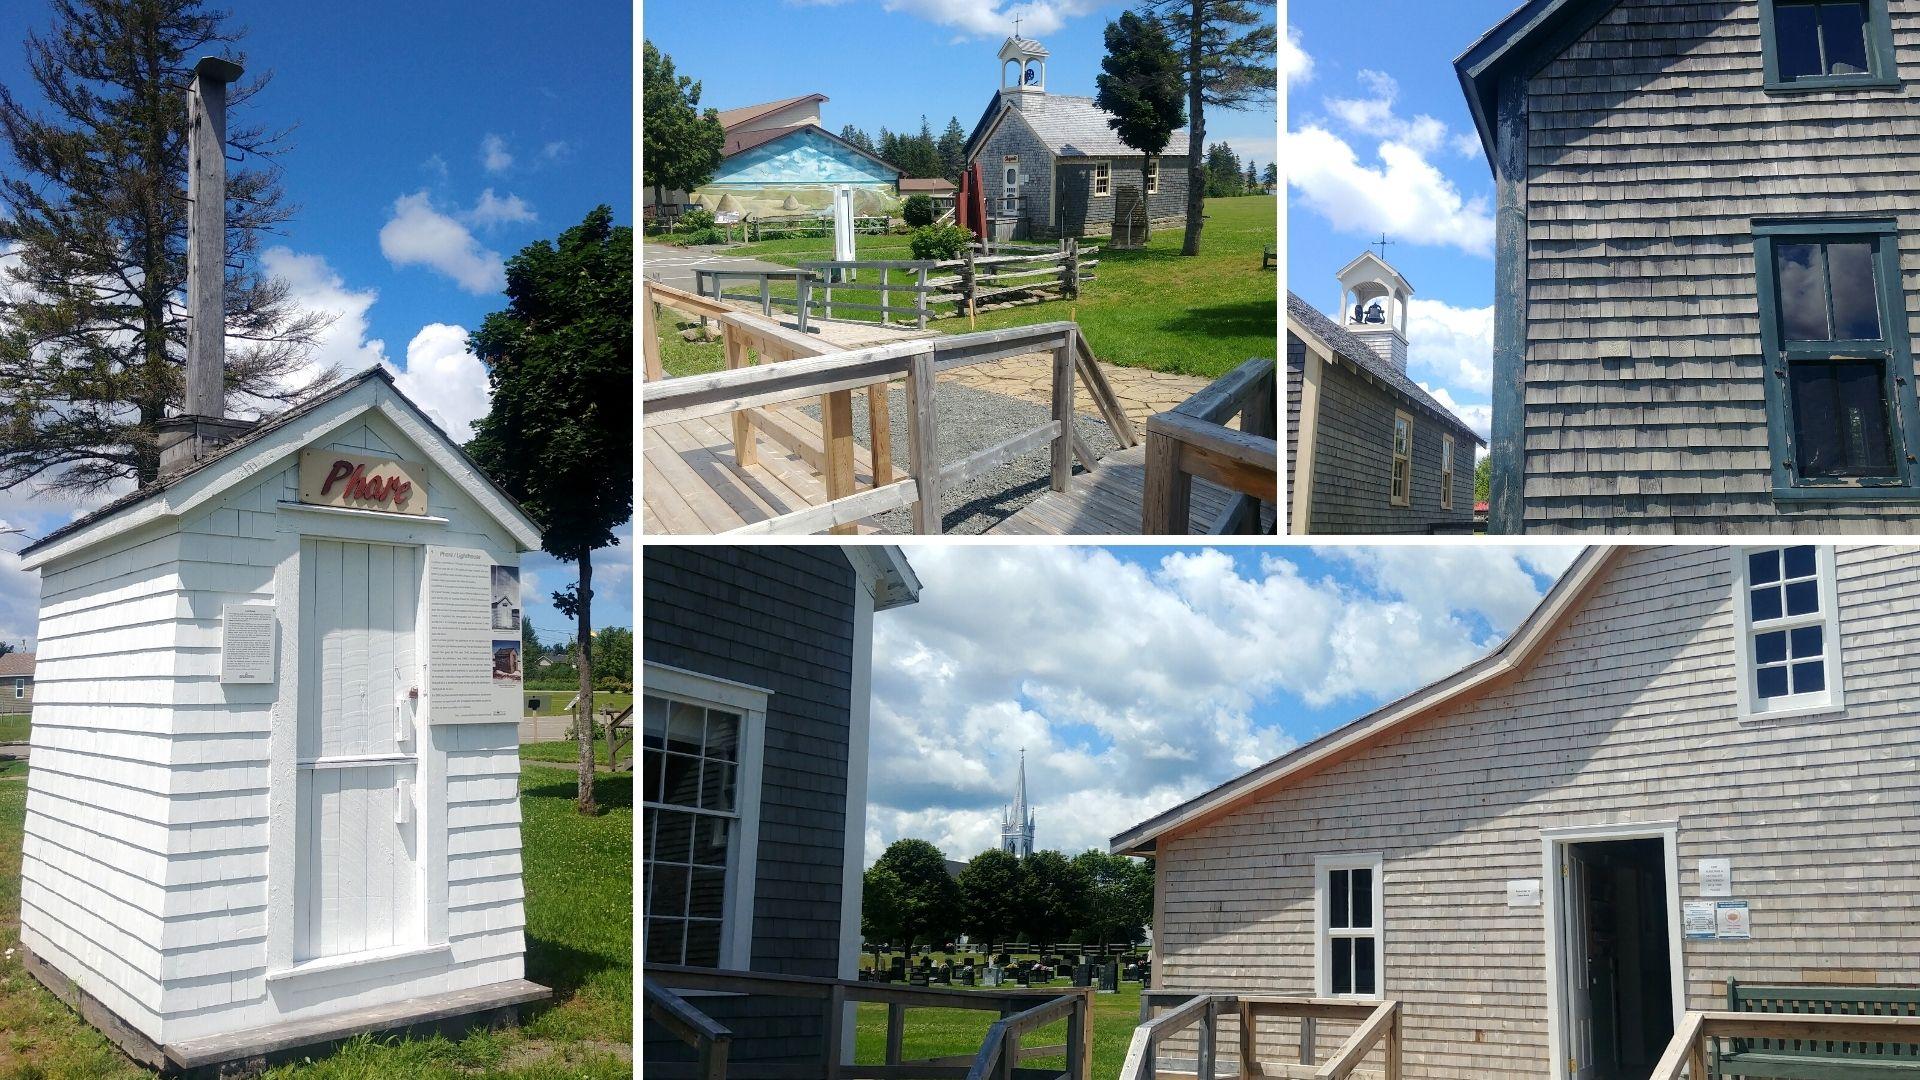 Village pionniers Grande-Digue Nouveau-Brunswick Canada